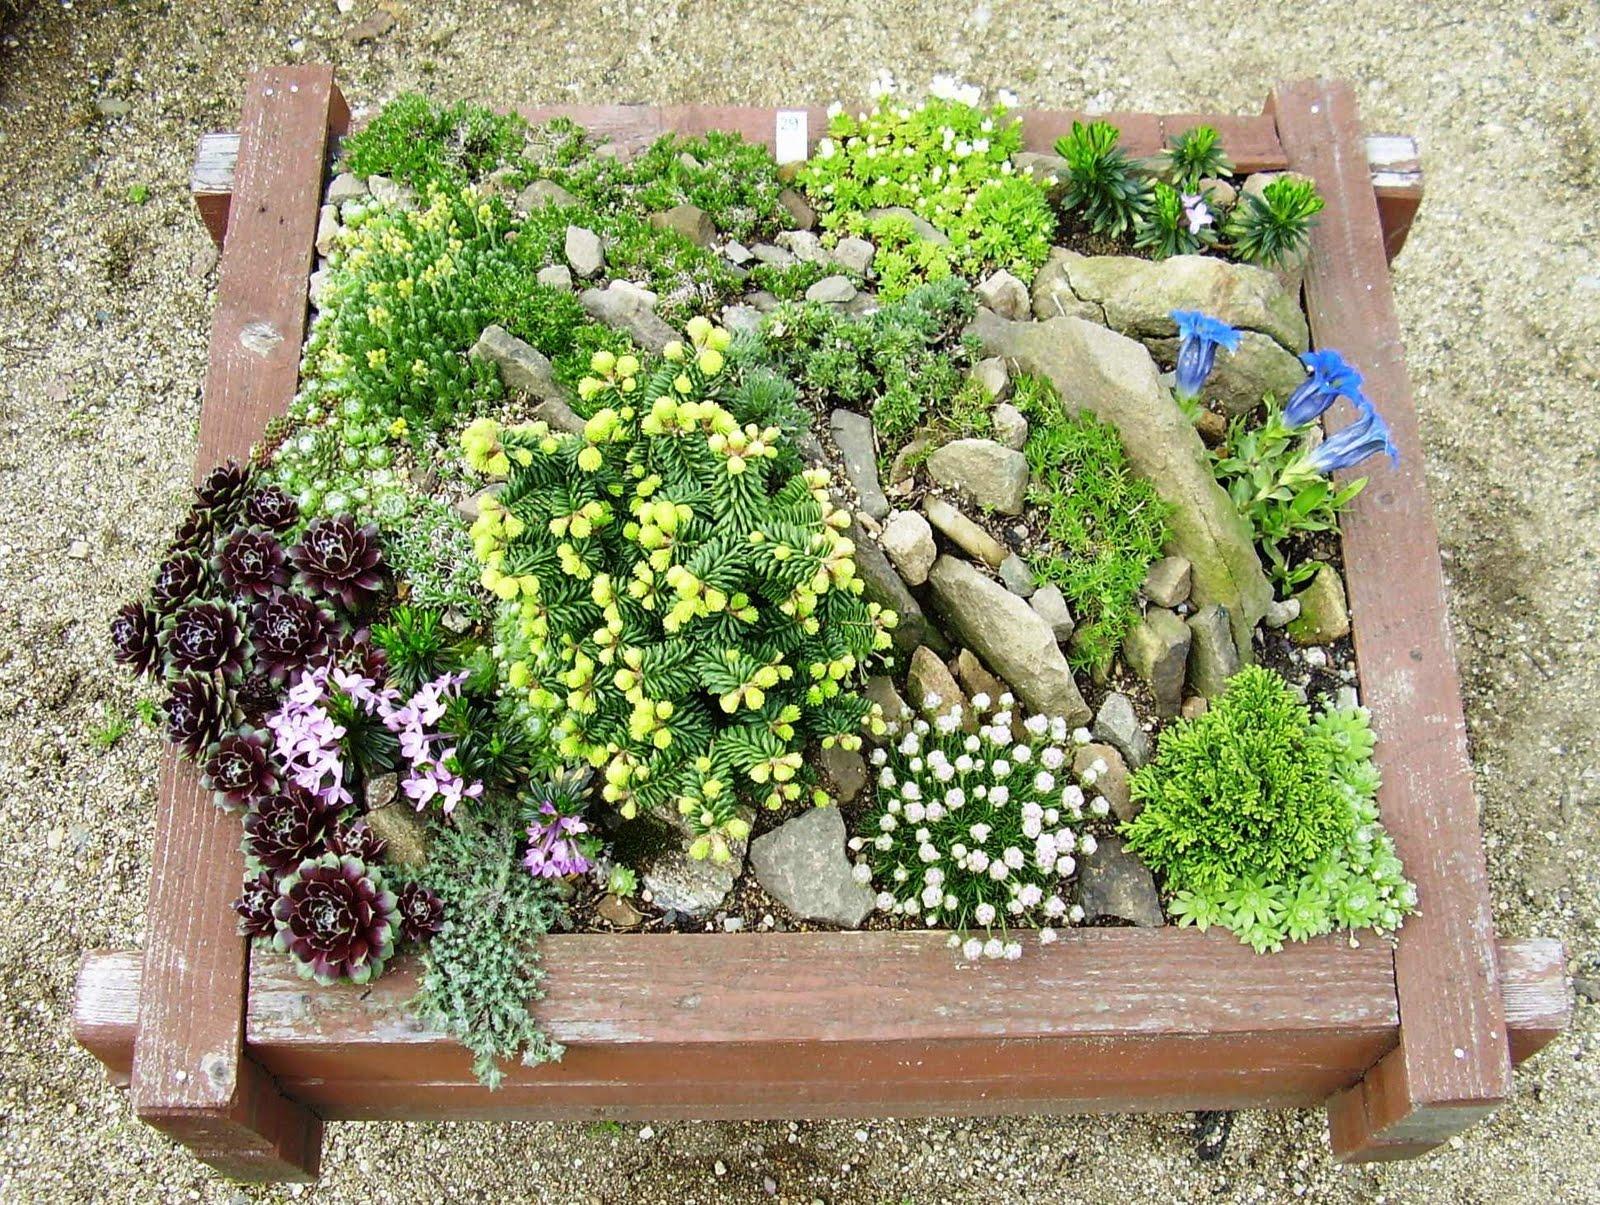 gardenless gardener: rock garden ideas on Small Garden Ideas With Rocks id=11672